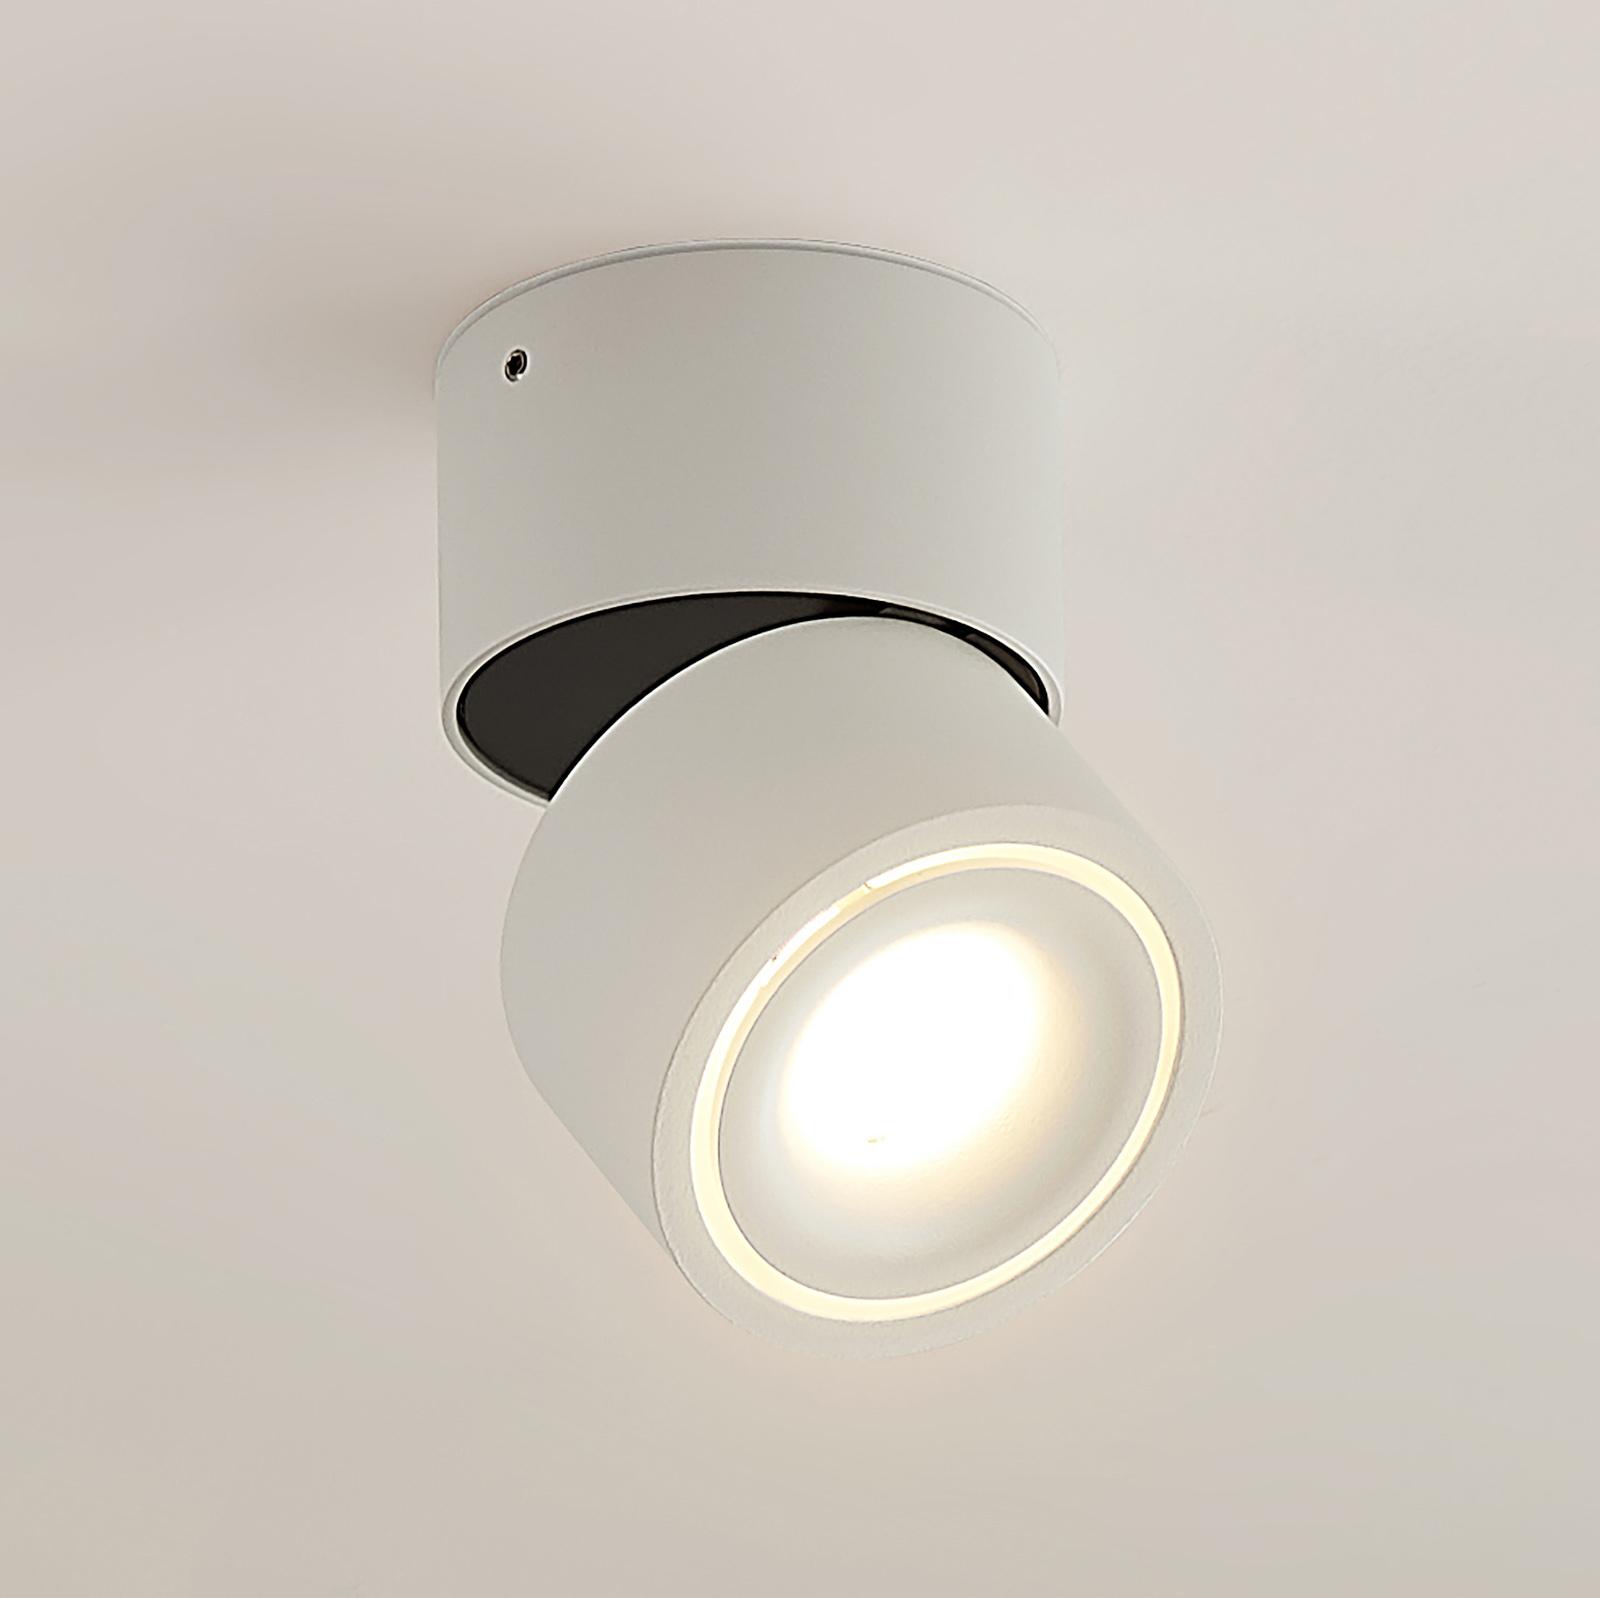 Arcchio Rotari spot sufitowy LED 1-punktowy 6,1W